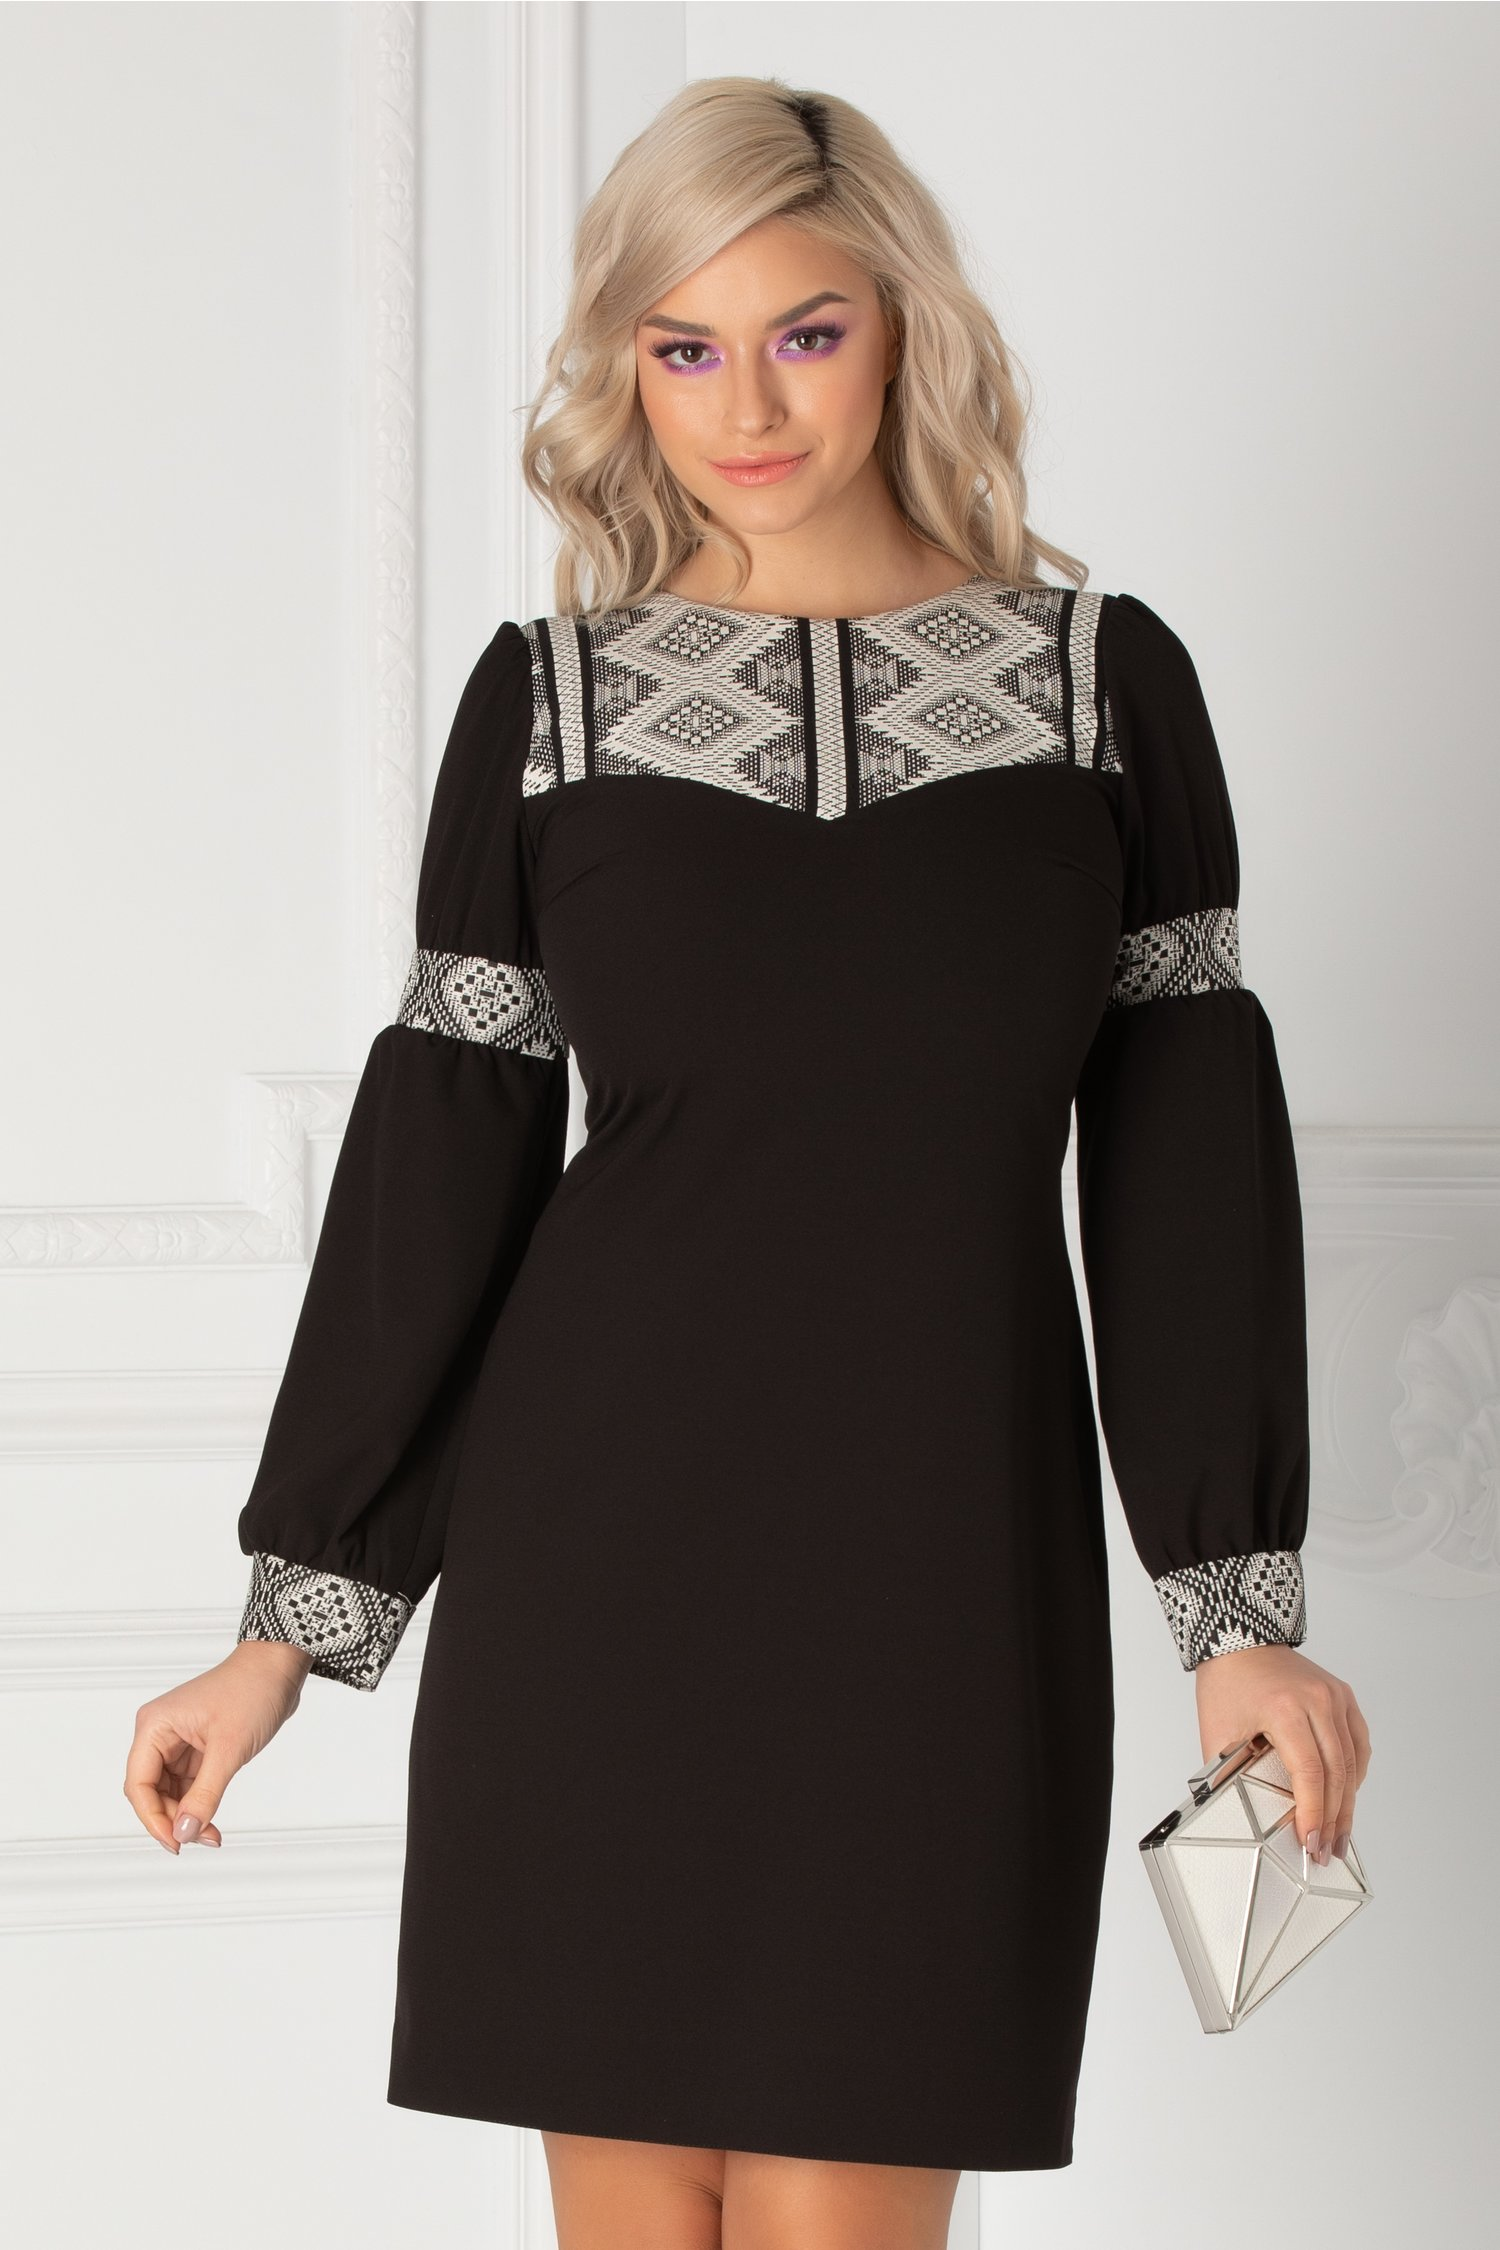 Rochie Moze neagra dreapta cu insertii geometrice albe